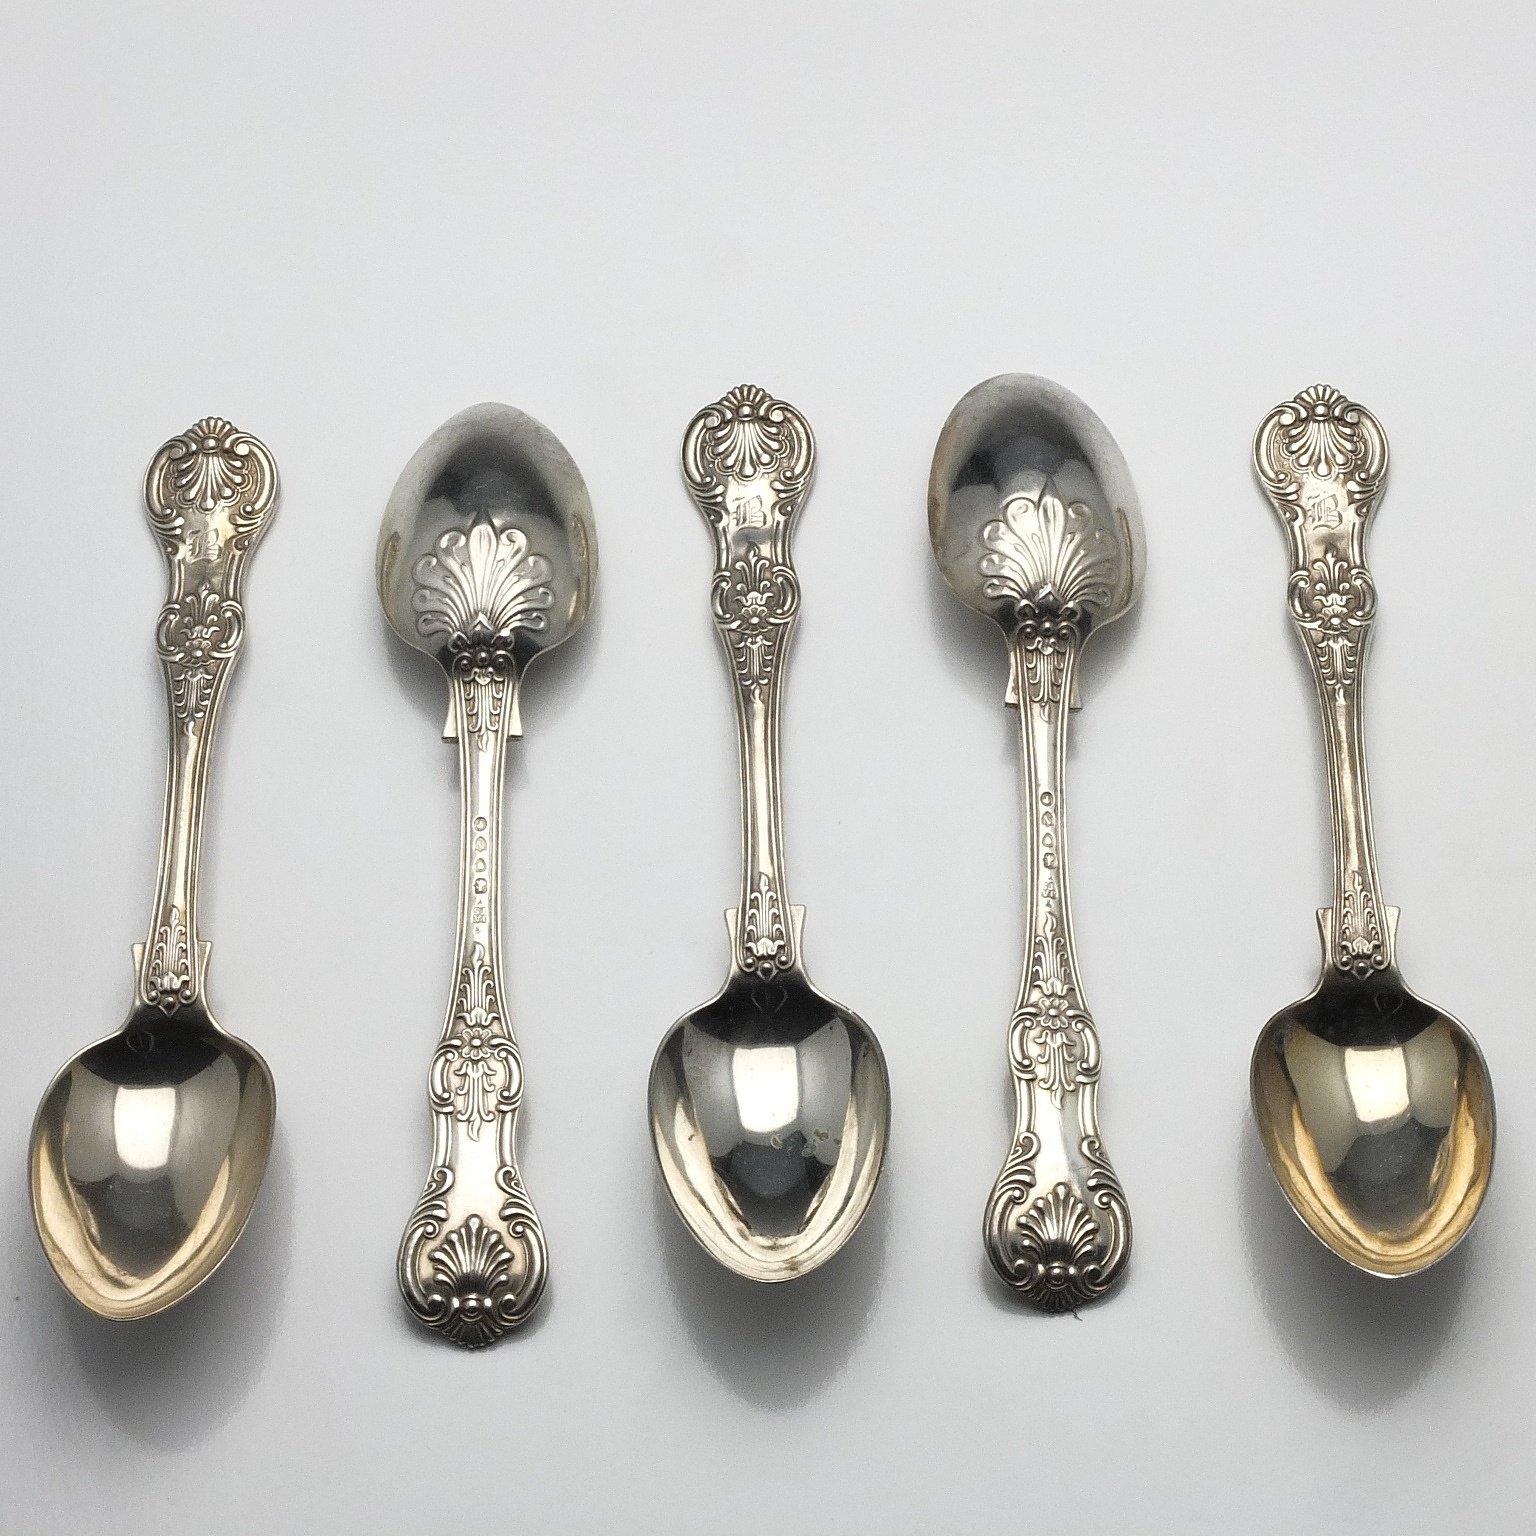 'Five Victorian Monogrammed Sterling Silver Kings Pattern Spoons John Aldwinckle & Thomas Slater London 1888'